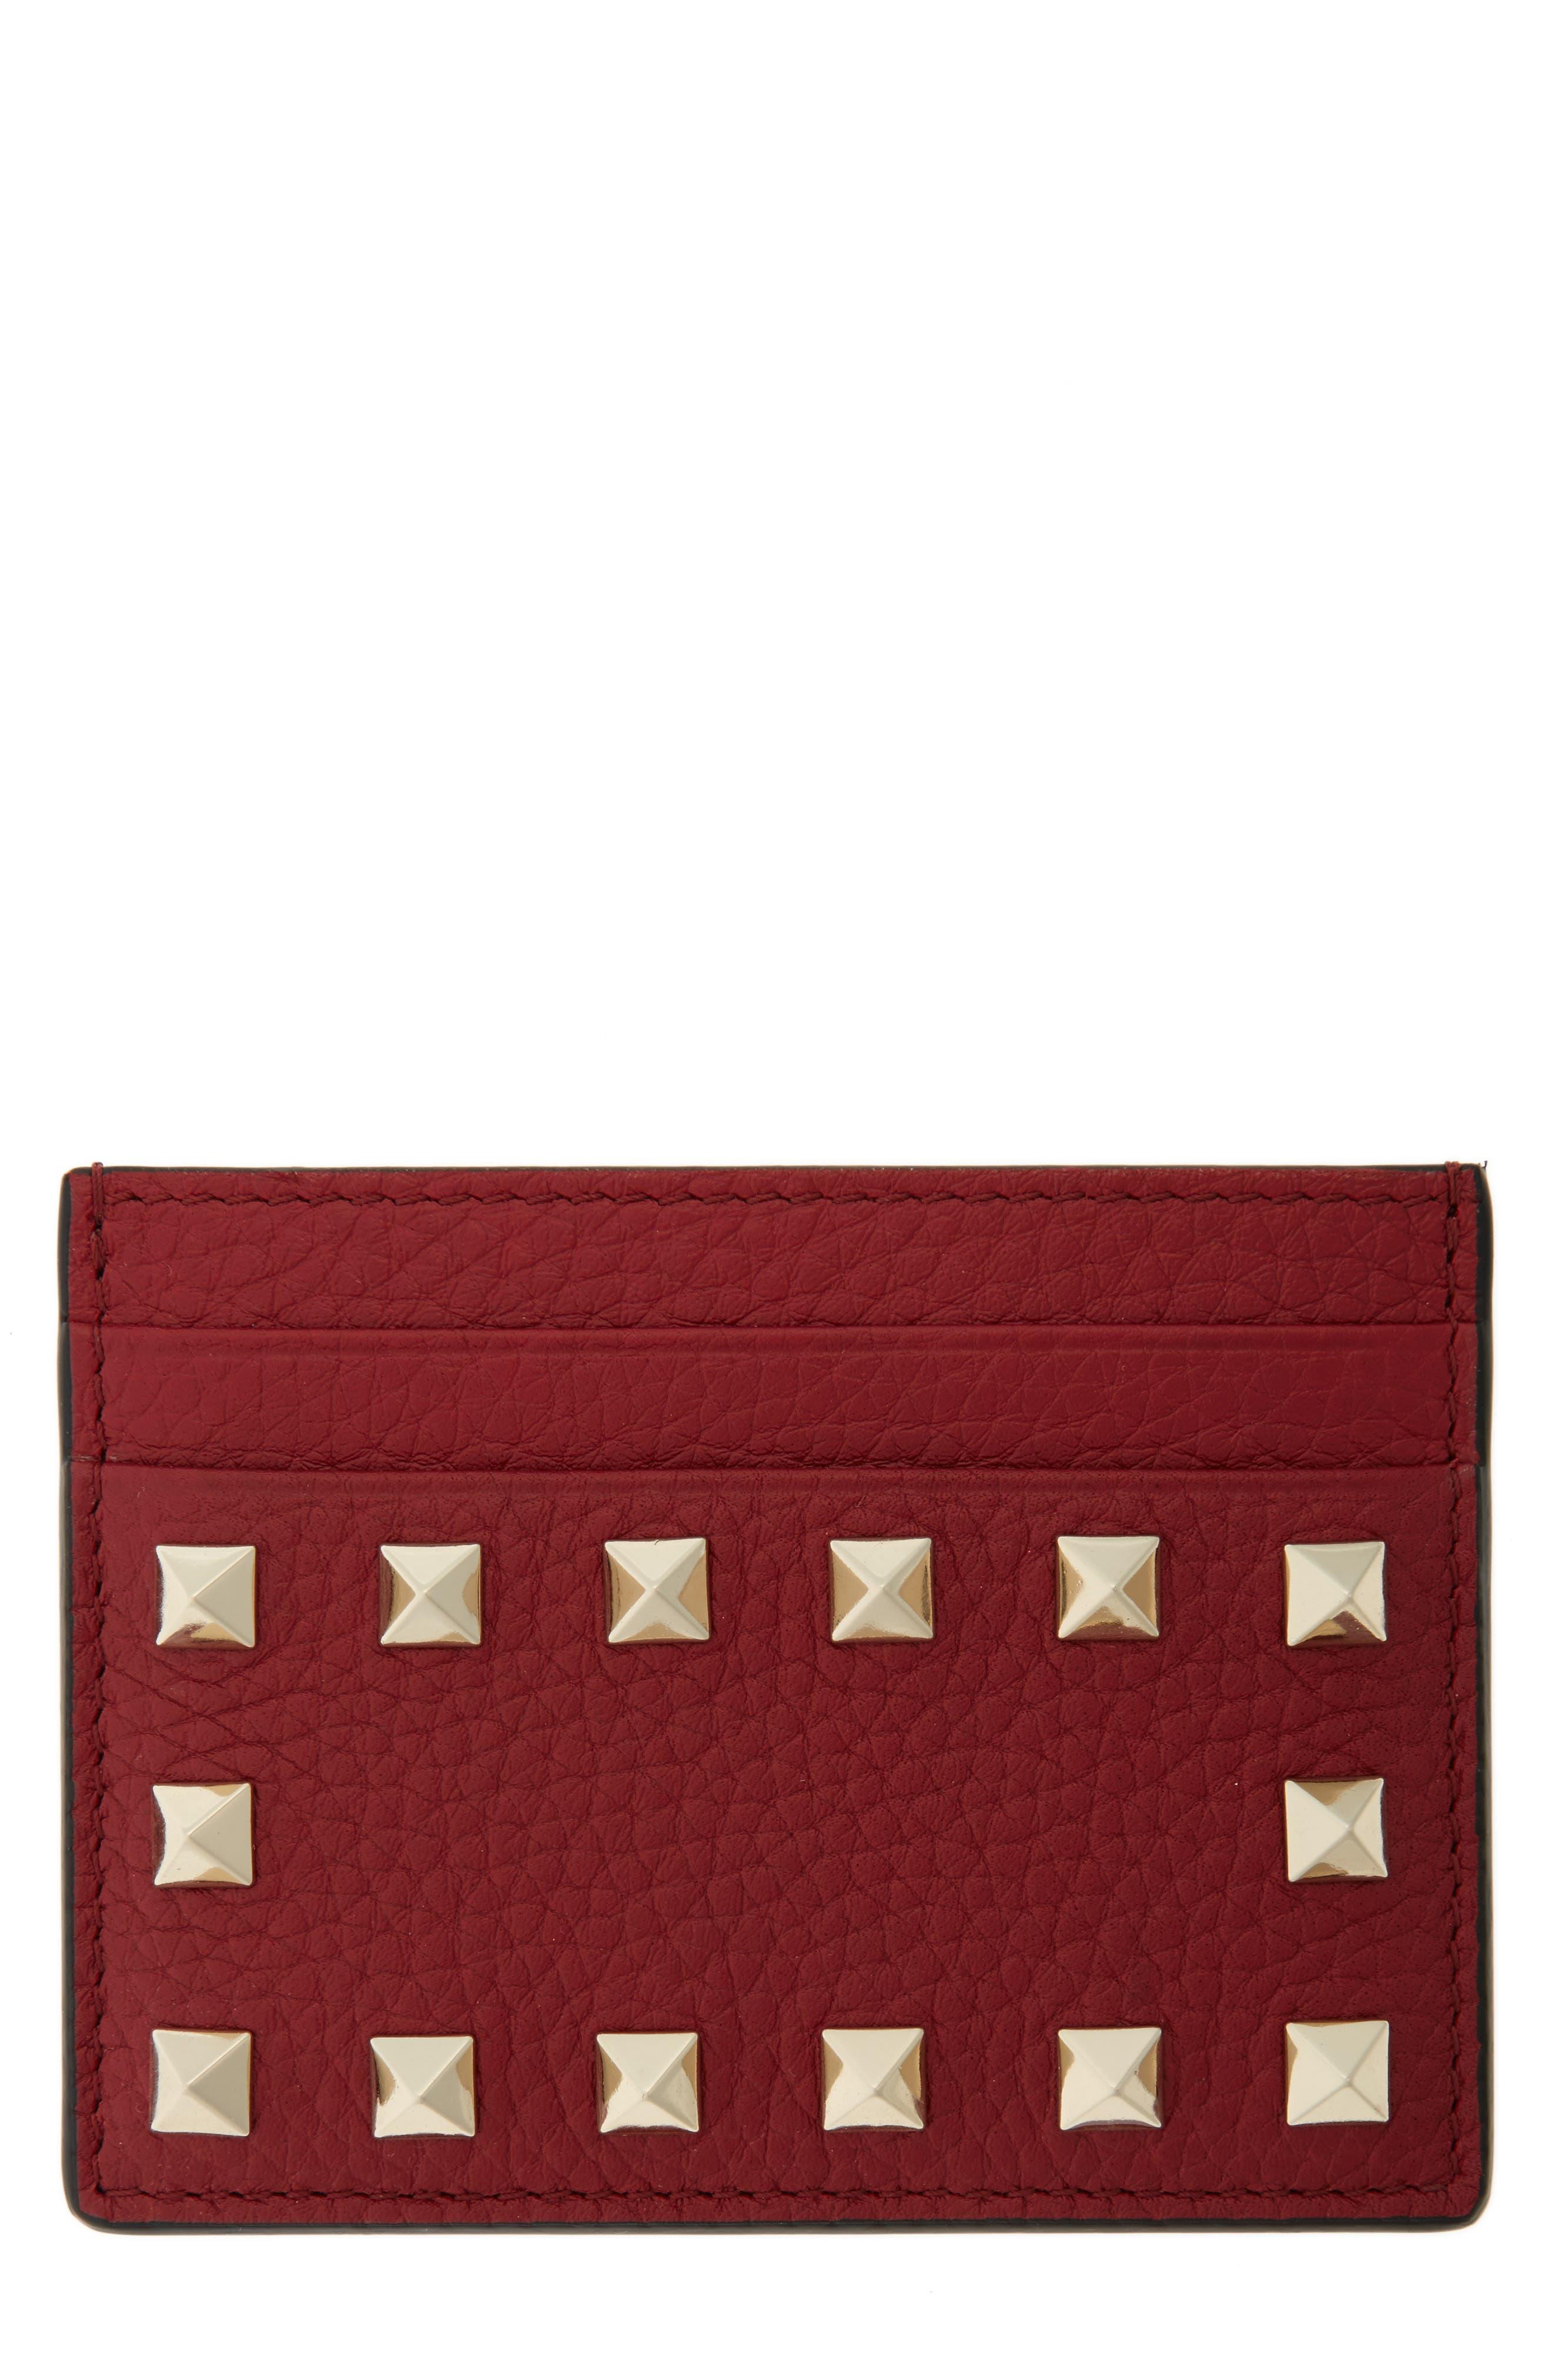 Main Image - VALENTINO GARAVANI Rockstud Leather Card Holder